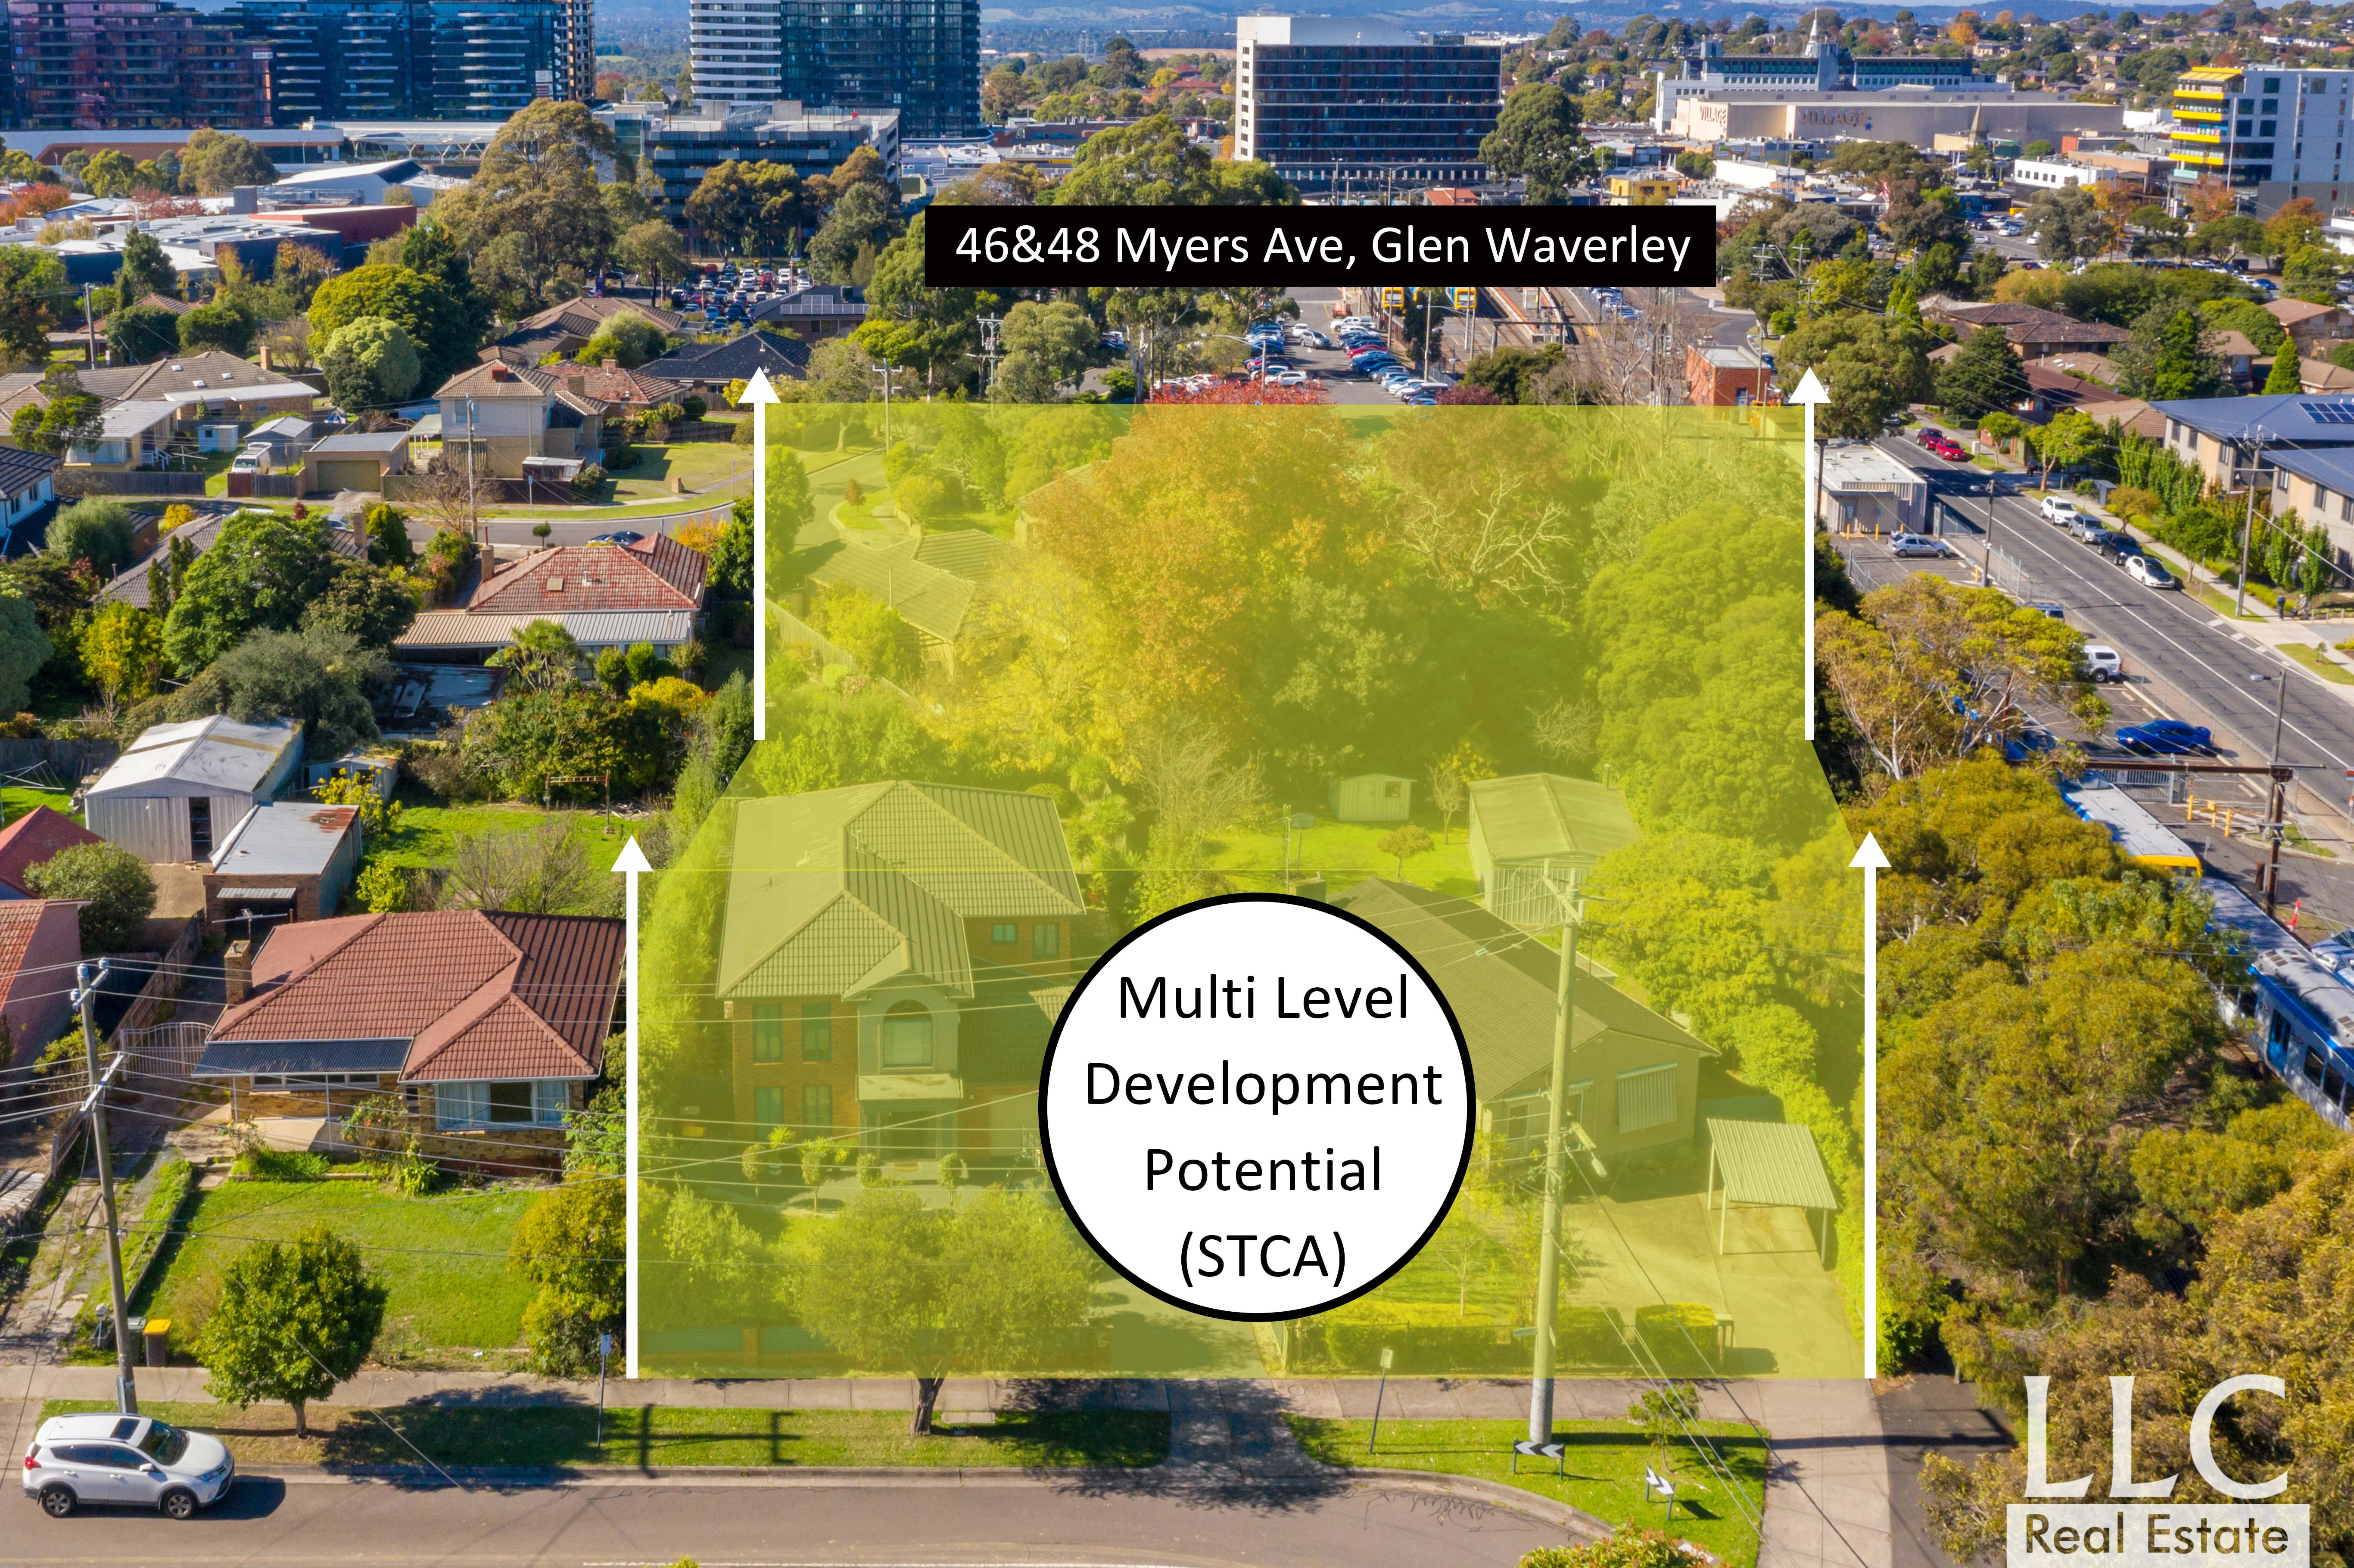 Rare opportunity, Multi-level Development Potential in Central Glen Waverley. (STCA)